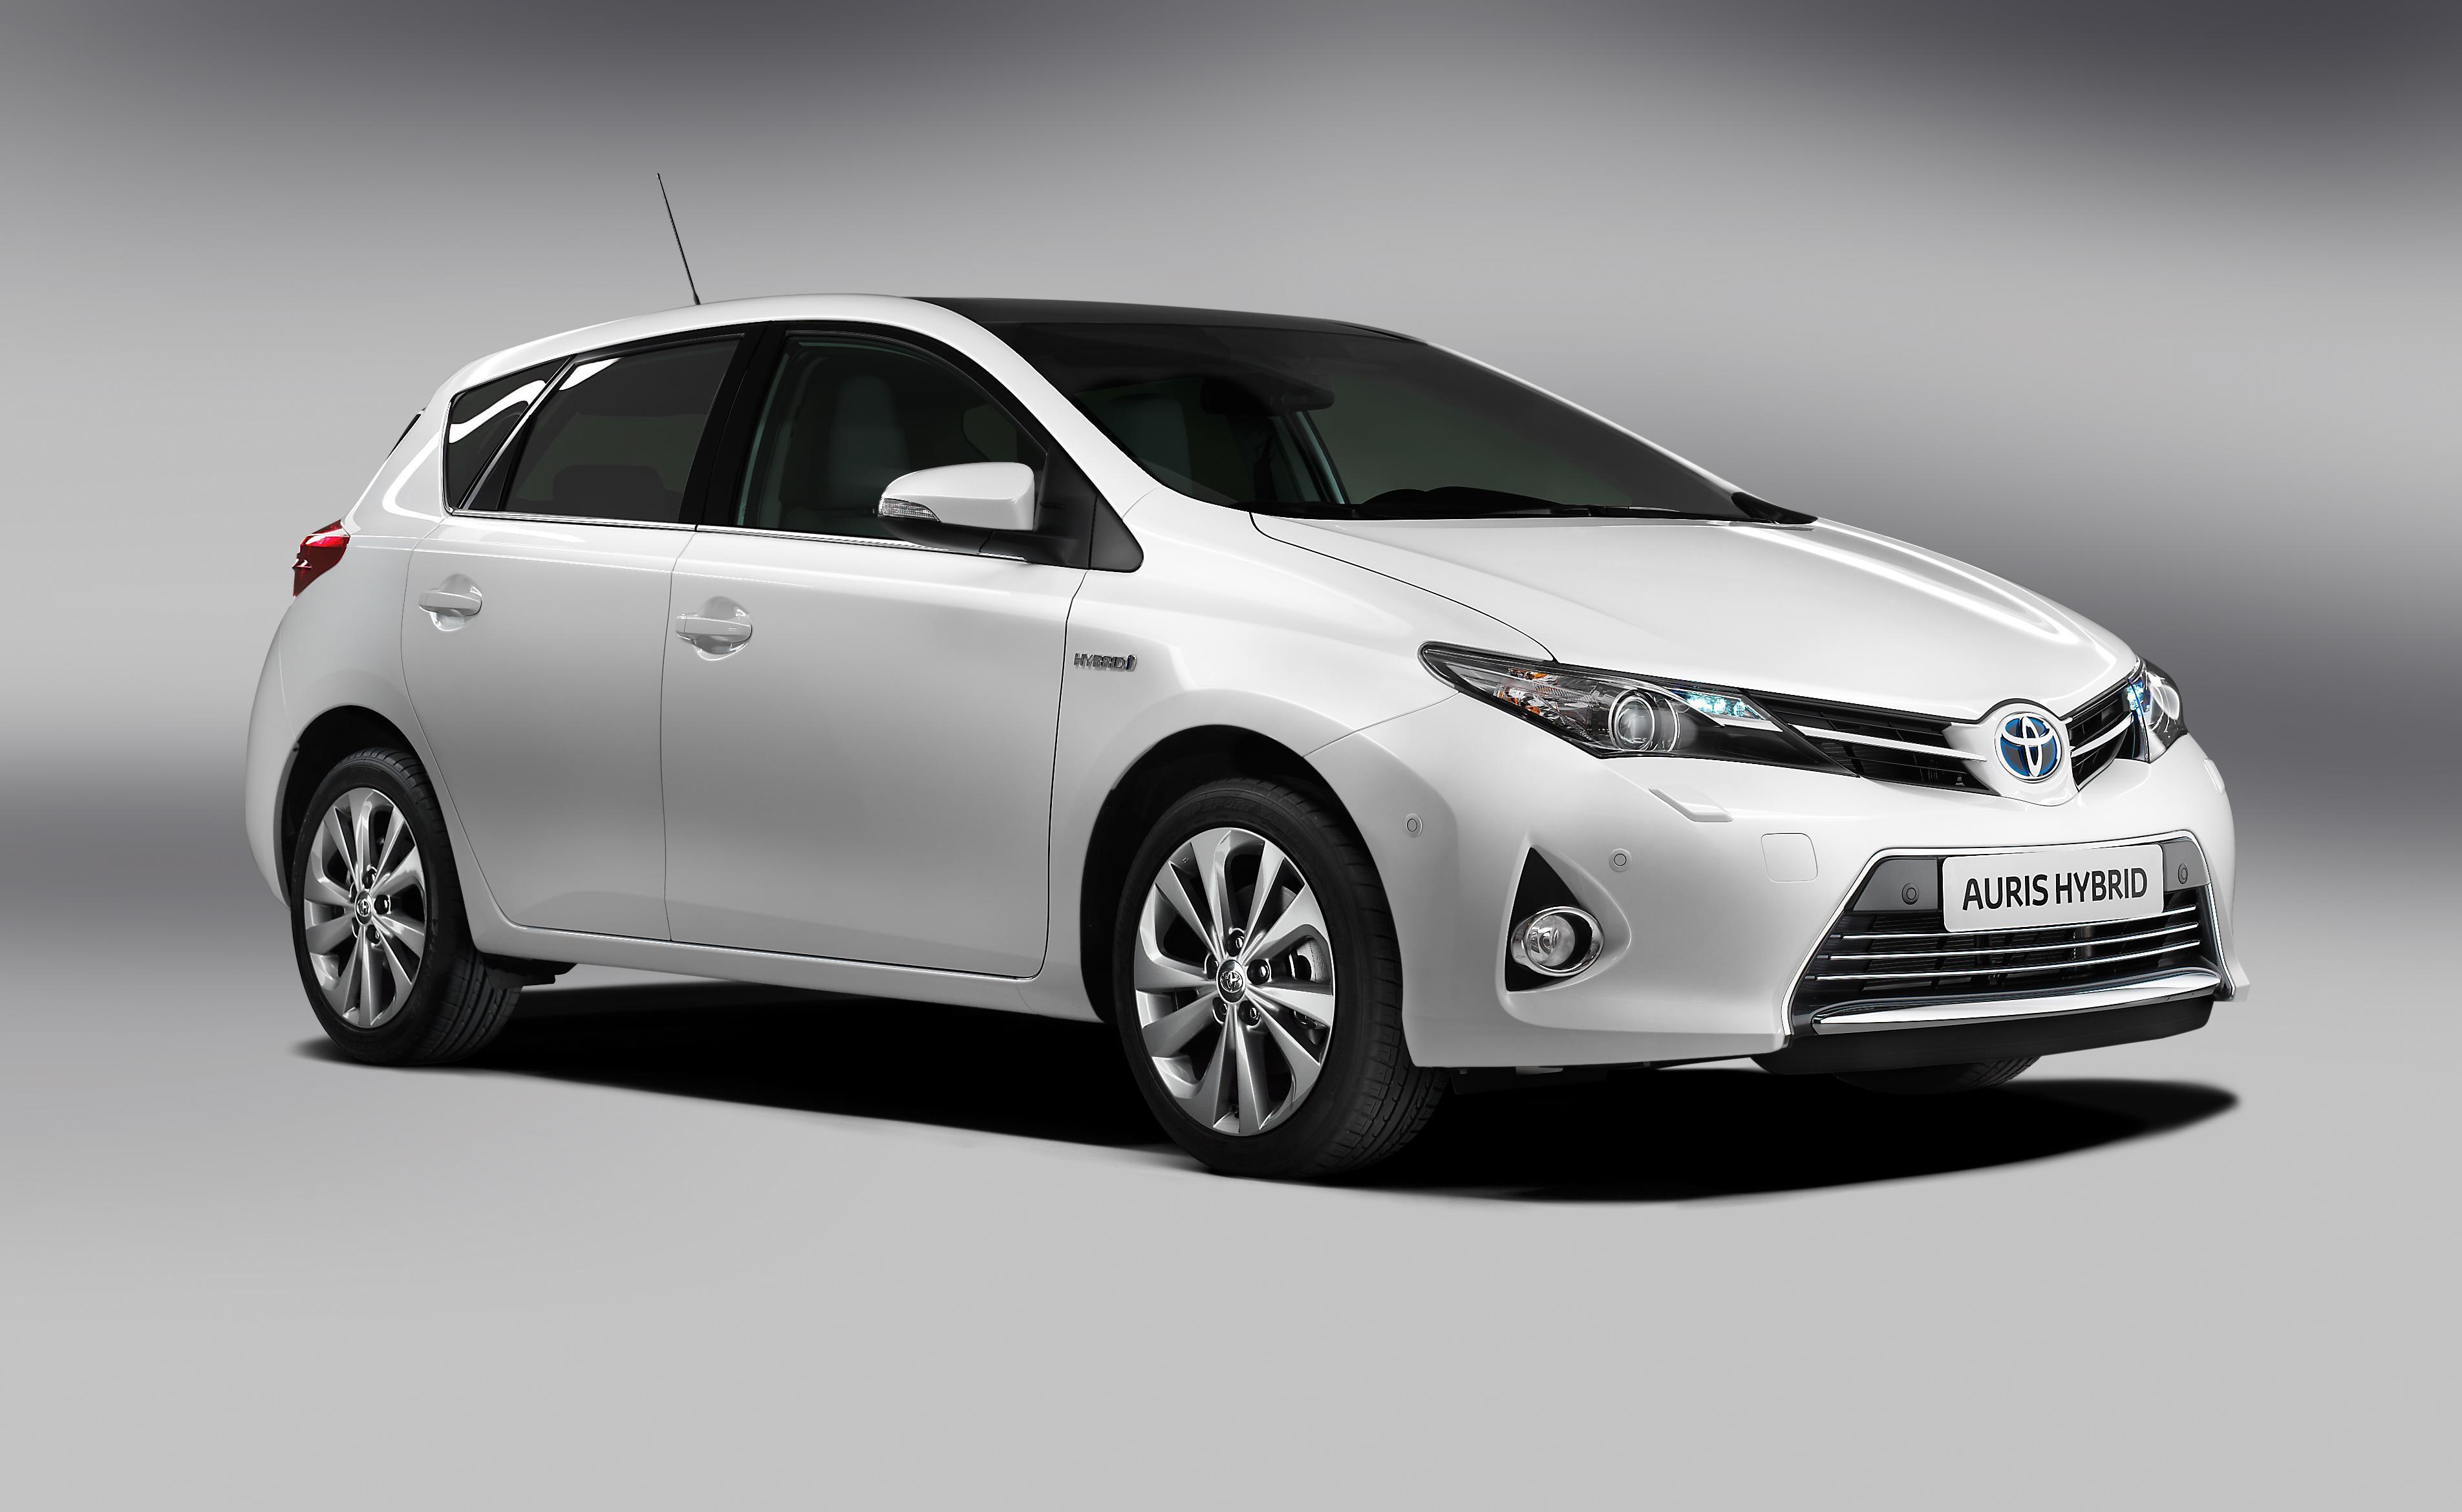 PluginCars.com - Plug-In Hybrid & Electric Vehicles